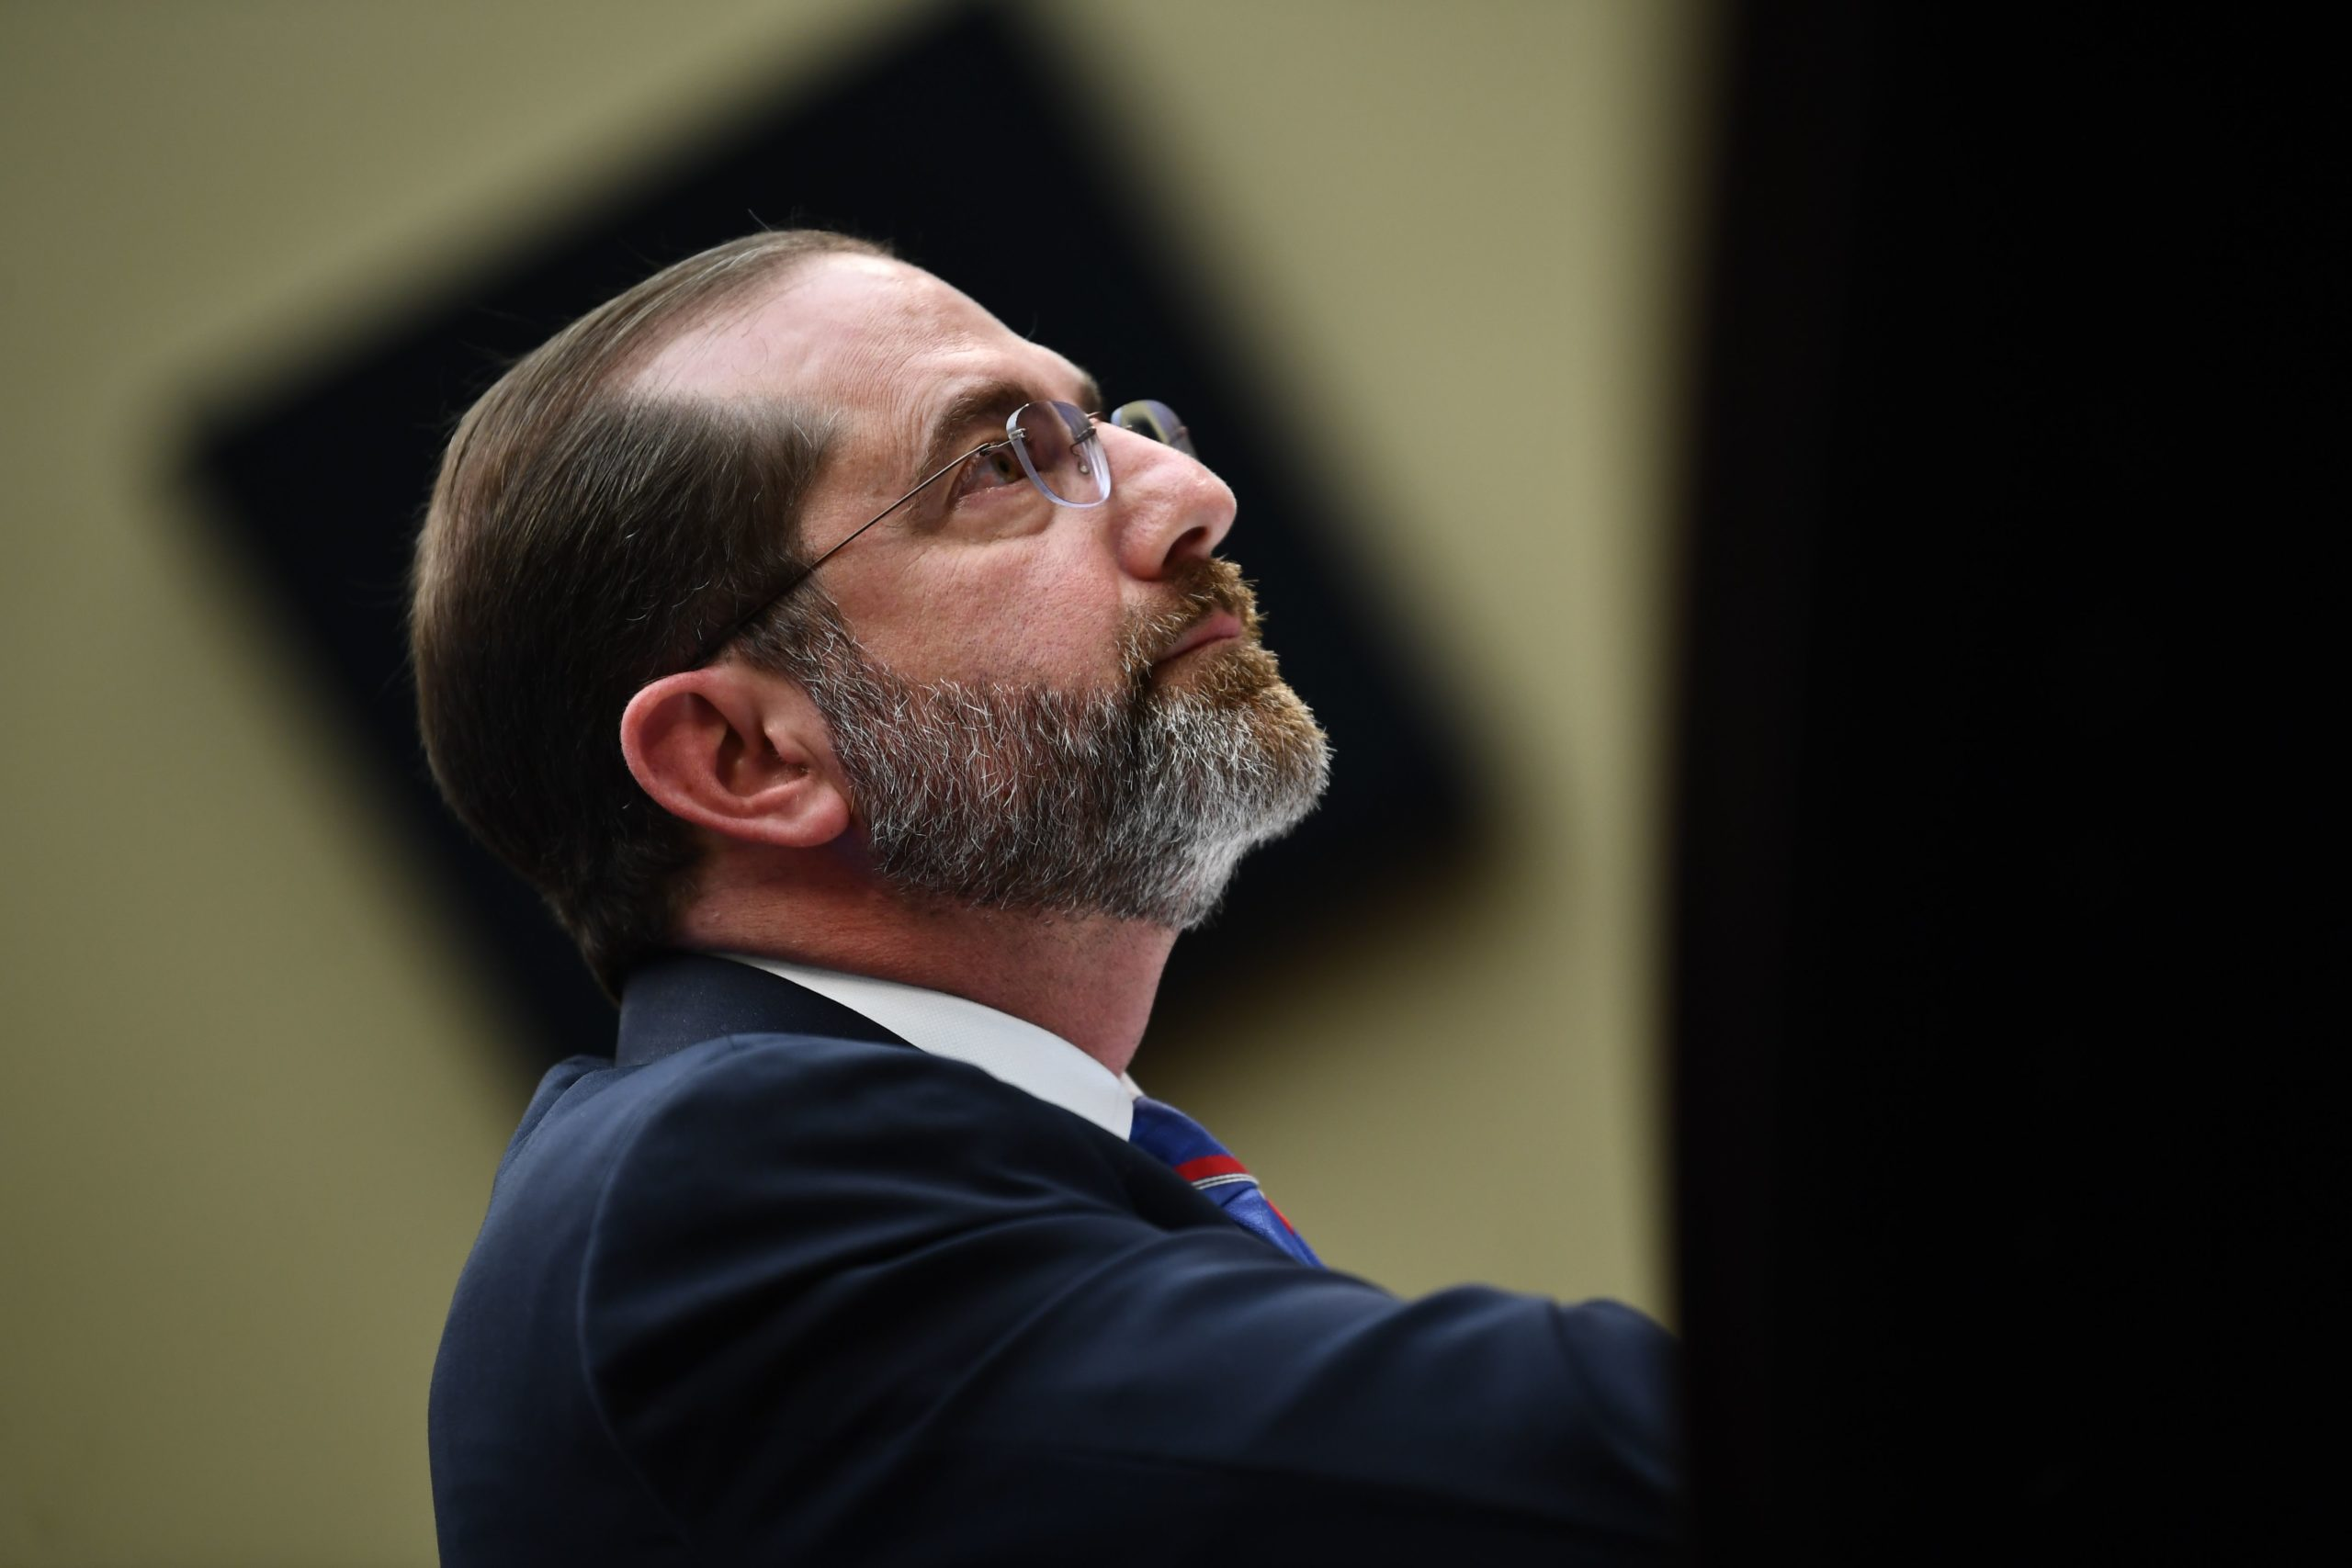 Health and Human Services Sec. Alex Azar listens during a House hearing on Feb. 26 Washington D.C. (Brendan Smialowski/AFP via Getty Images)